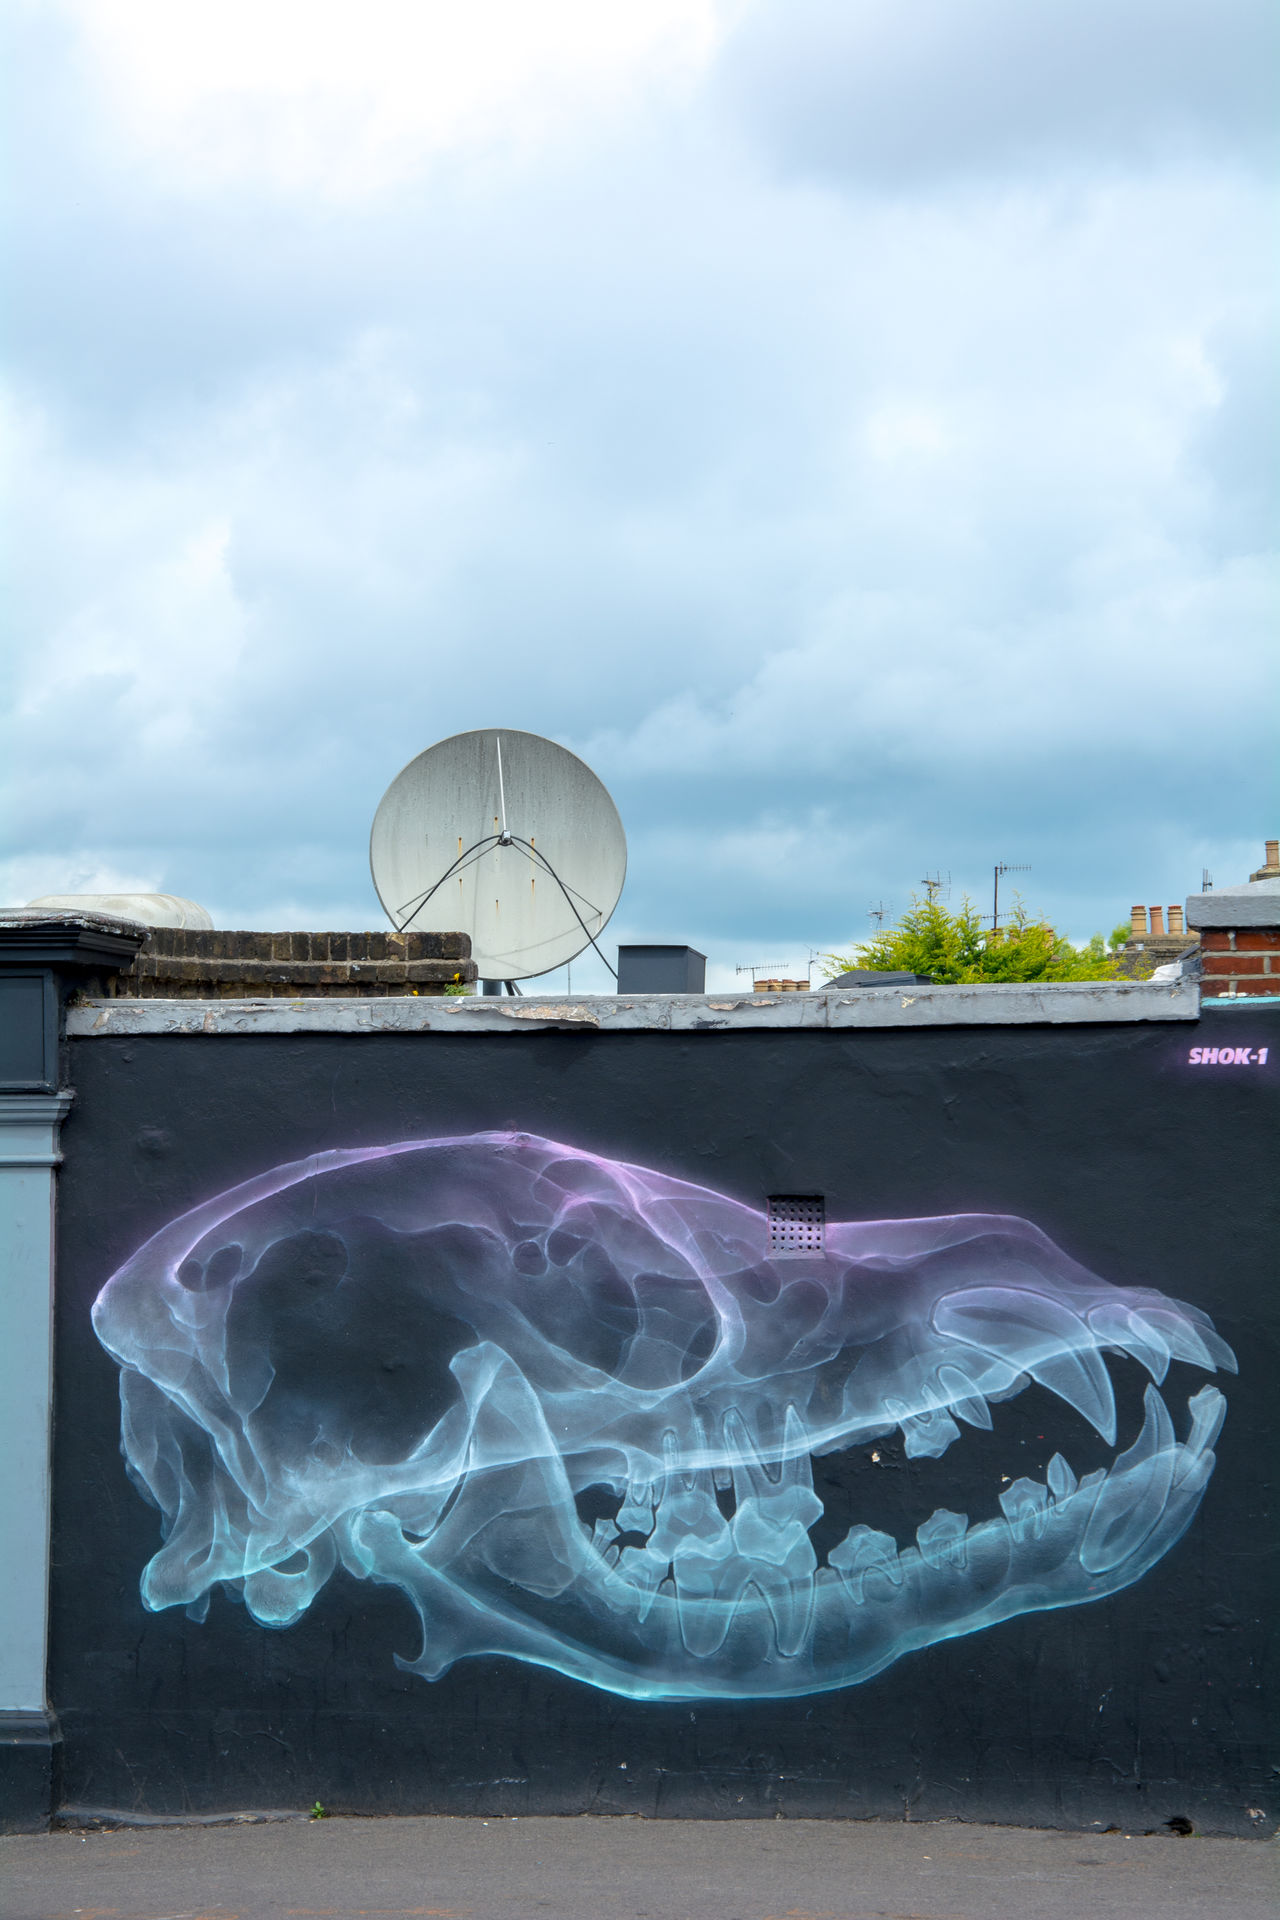 Animal ArtWork Carnivorous Dog-skul Drawing EyeEmNewHere Graffiti Hip-Hop London Mammal Mural No People Painting Parabola Skull Skull Art Street The Bell  Travel Wall Wall Art Waltham Forest Council X-Ray X-ray Art